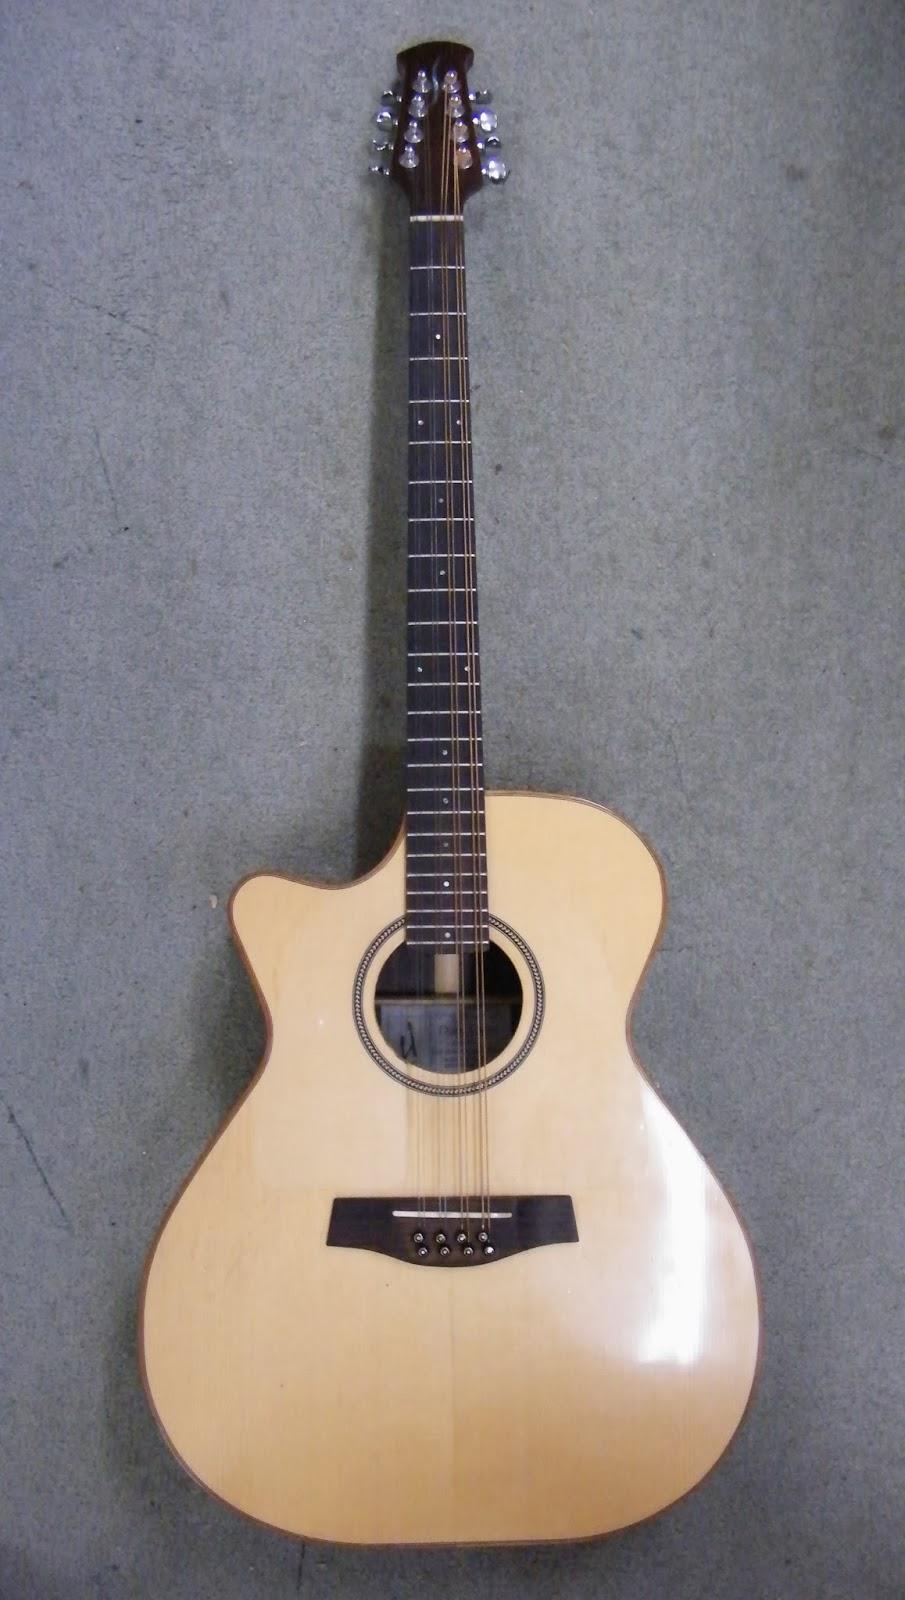 Mr Glyn\'s guitar repair: Bouzouki/Gouzouki – an unusual modification